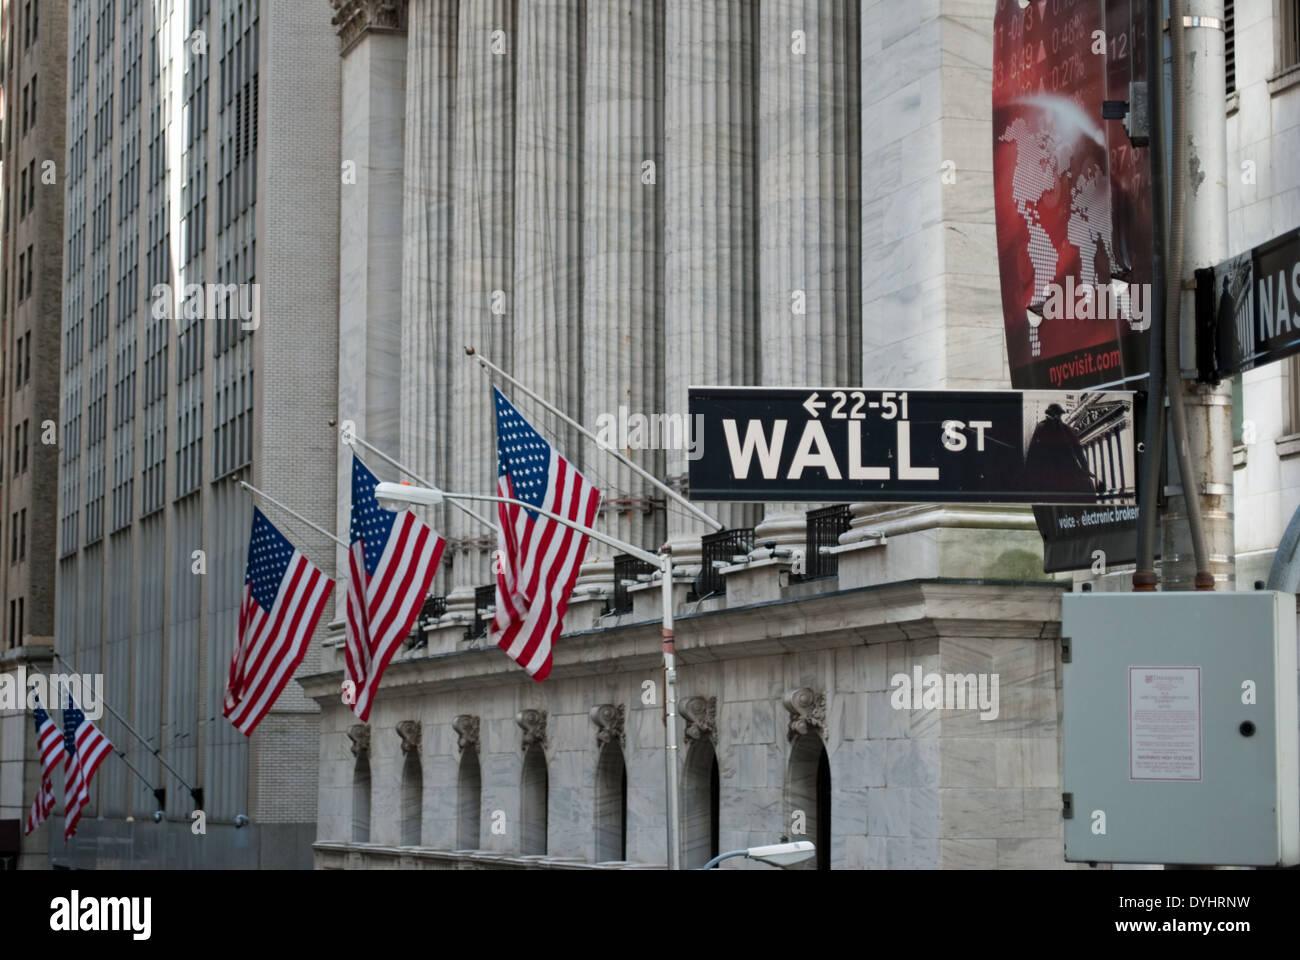 wall street - Stock Image